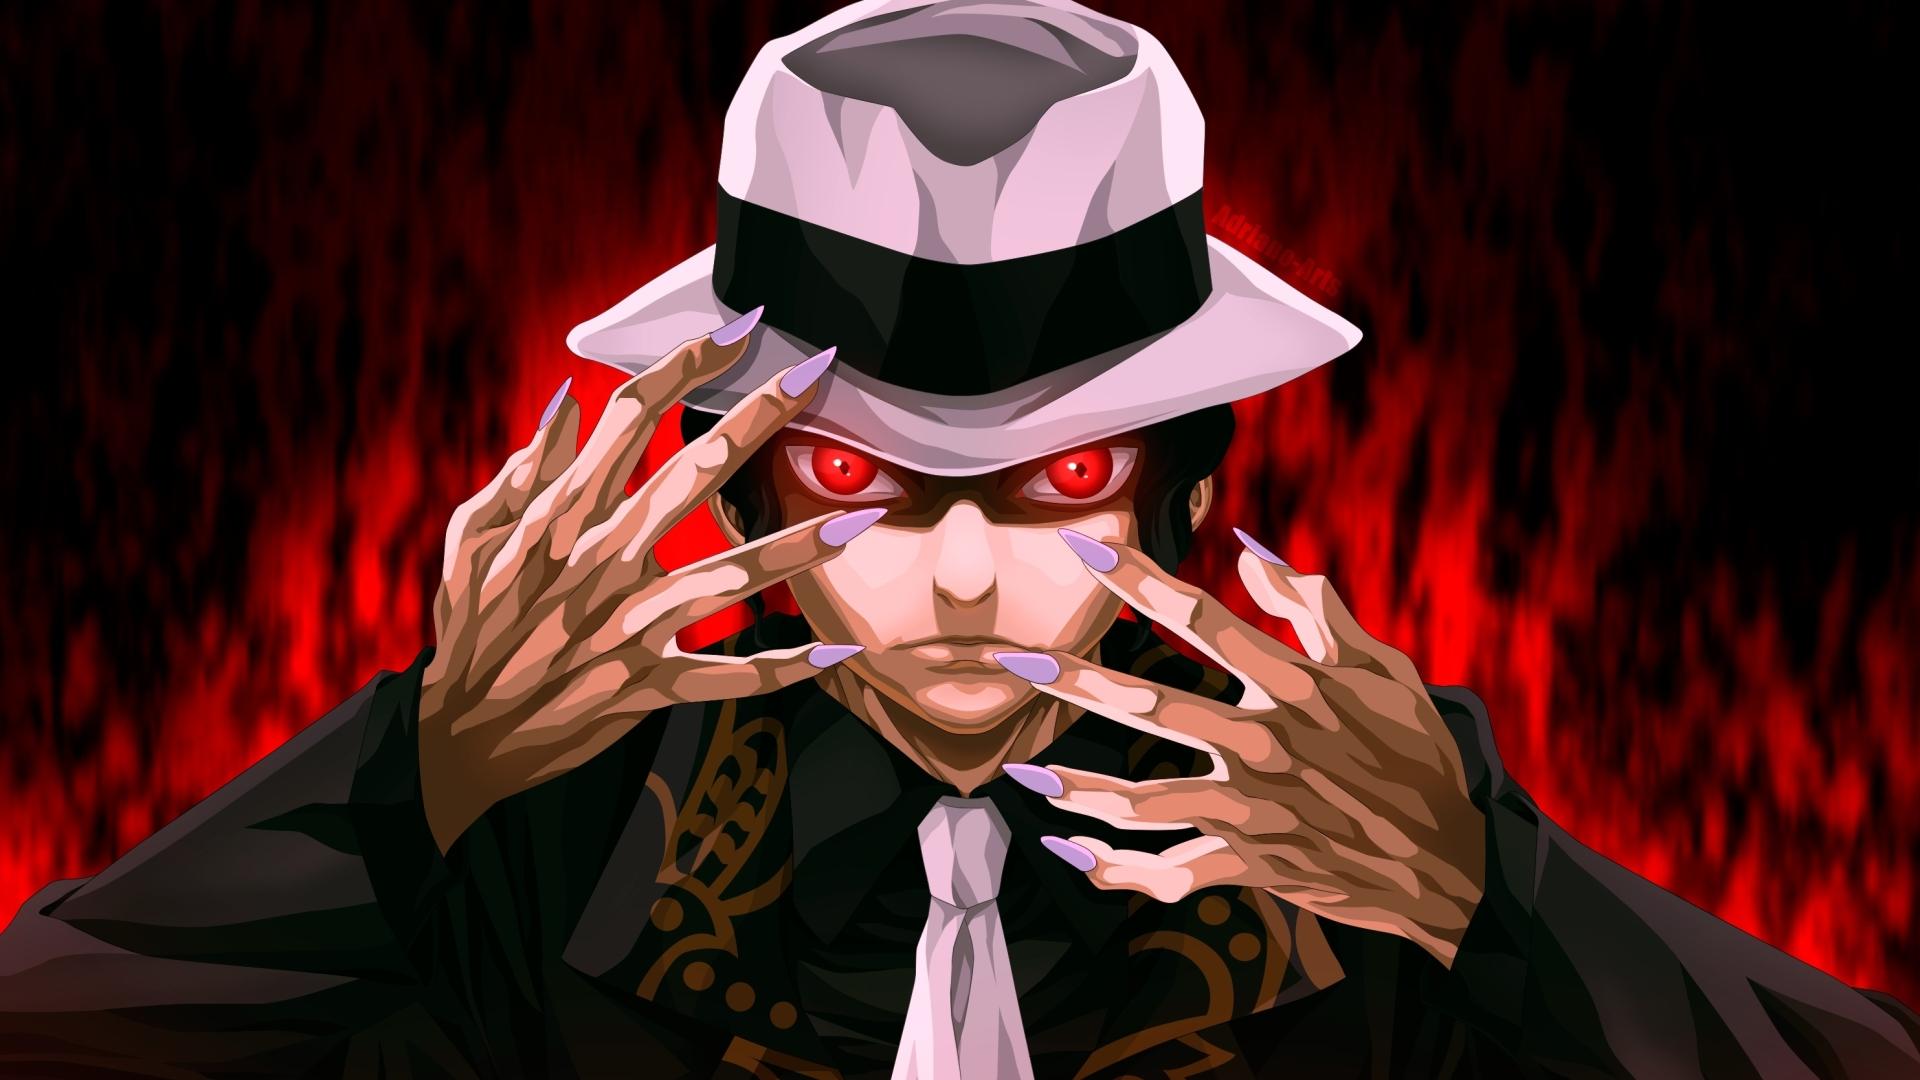 1920x1080 Muzan Kibutsuji In Demon Slayer 1080P Laptop ...